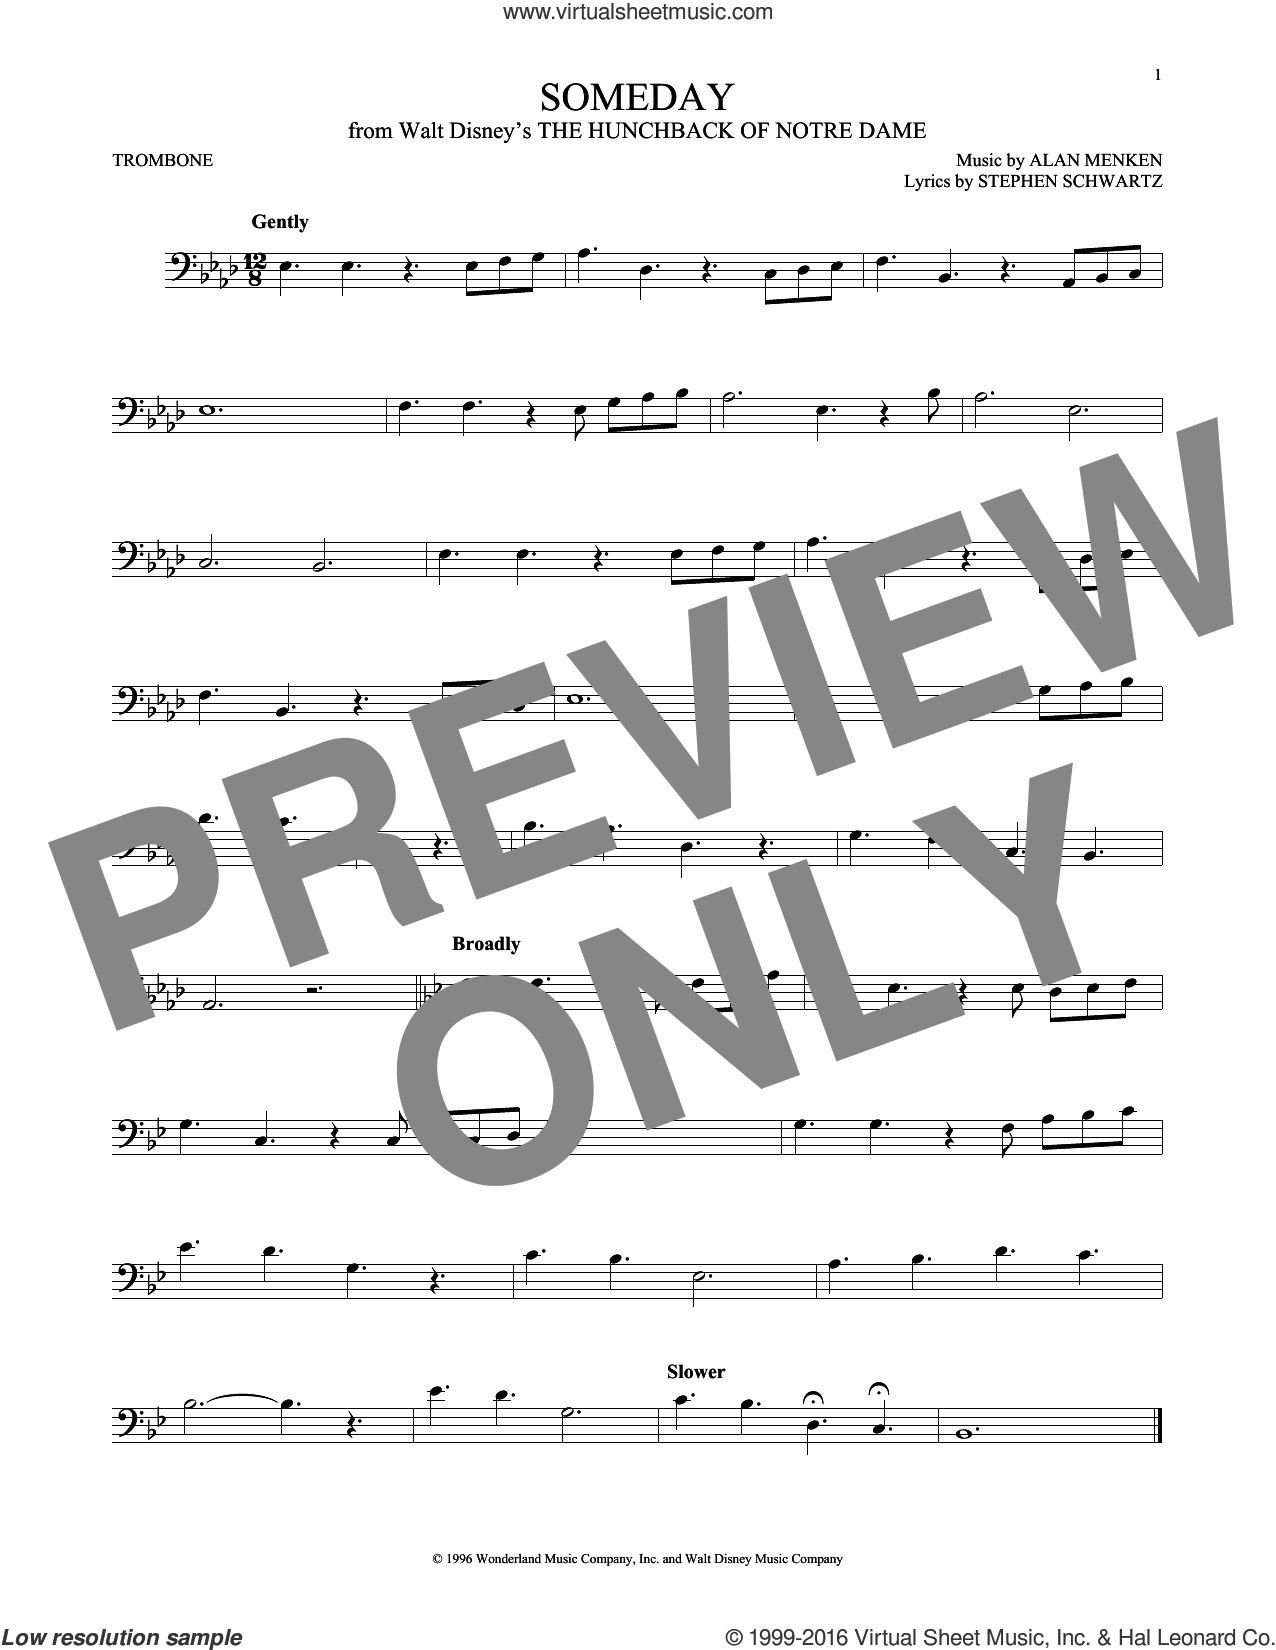 Someday (Esmeralda's Prayer) sheet music for trombone solo by Alan Menken, Donna Summer and Stephen Schwartz, intermediate skill level